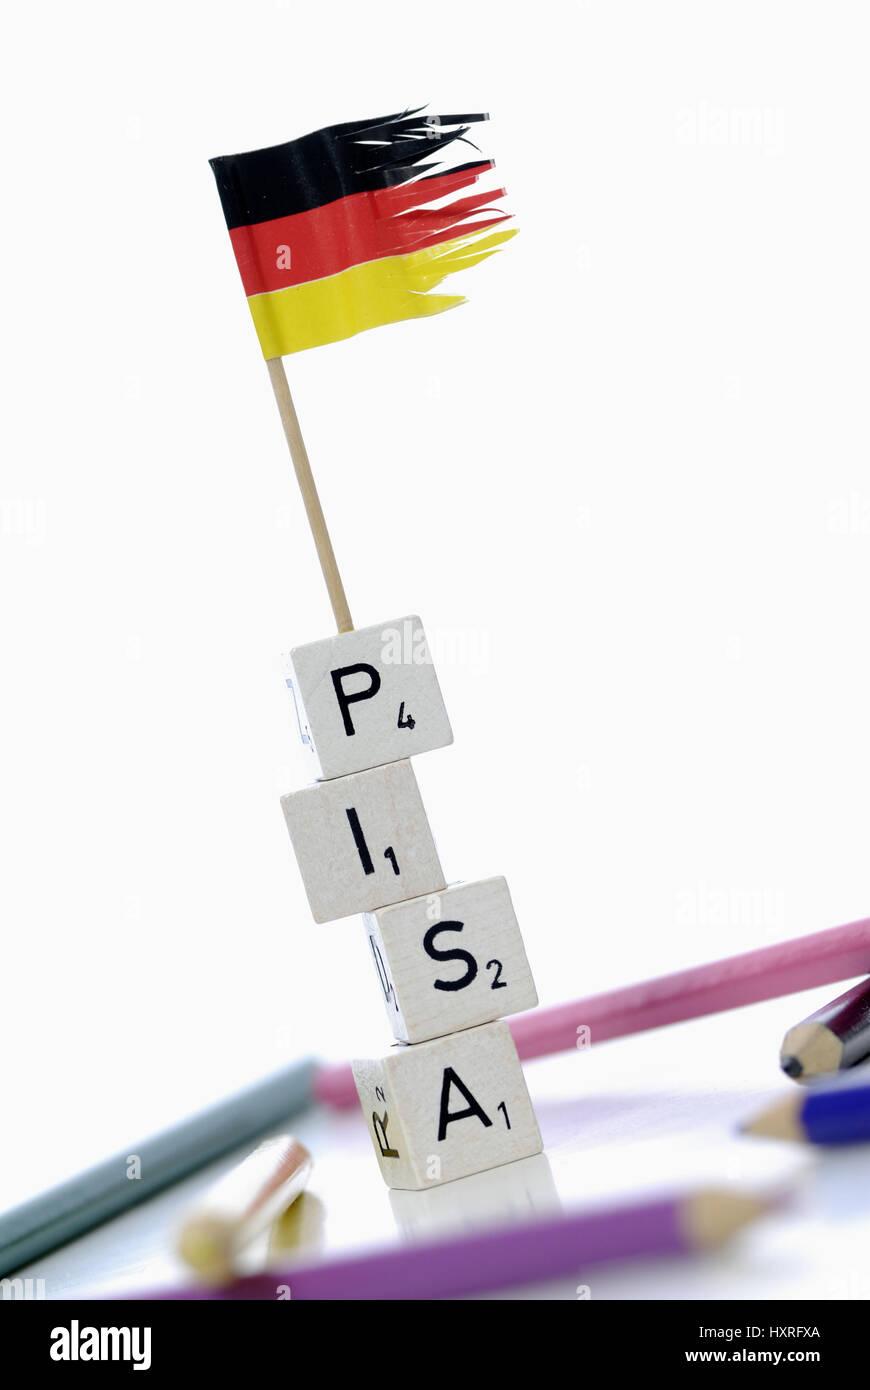 Pisa study, Pisa, study, studies, Germany, badly, education, educational plight, school, schools, bad, bad, stupidly, silly, schoolboys, educational t Stock Photo